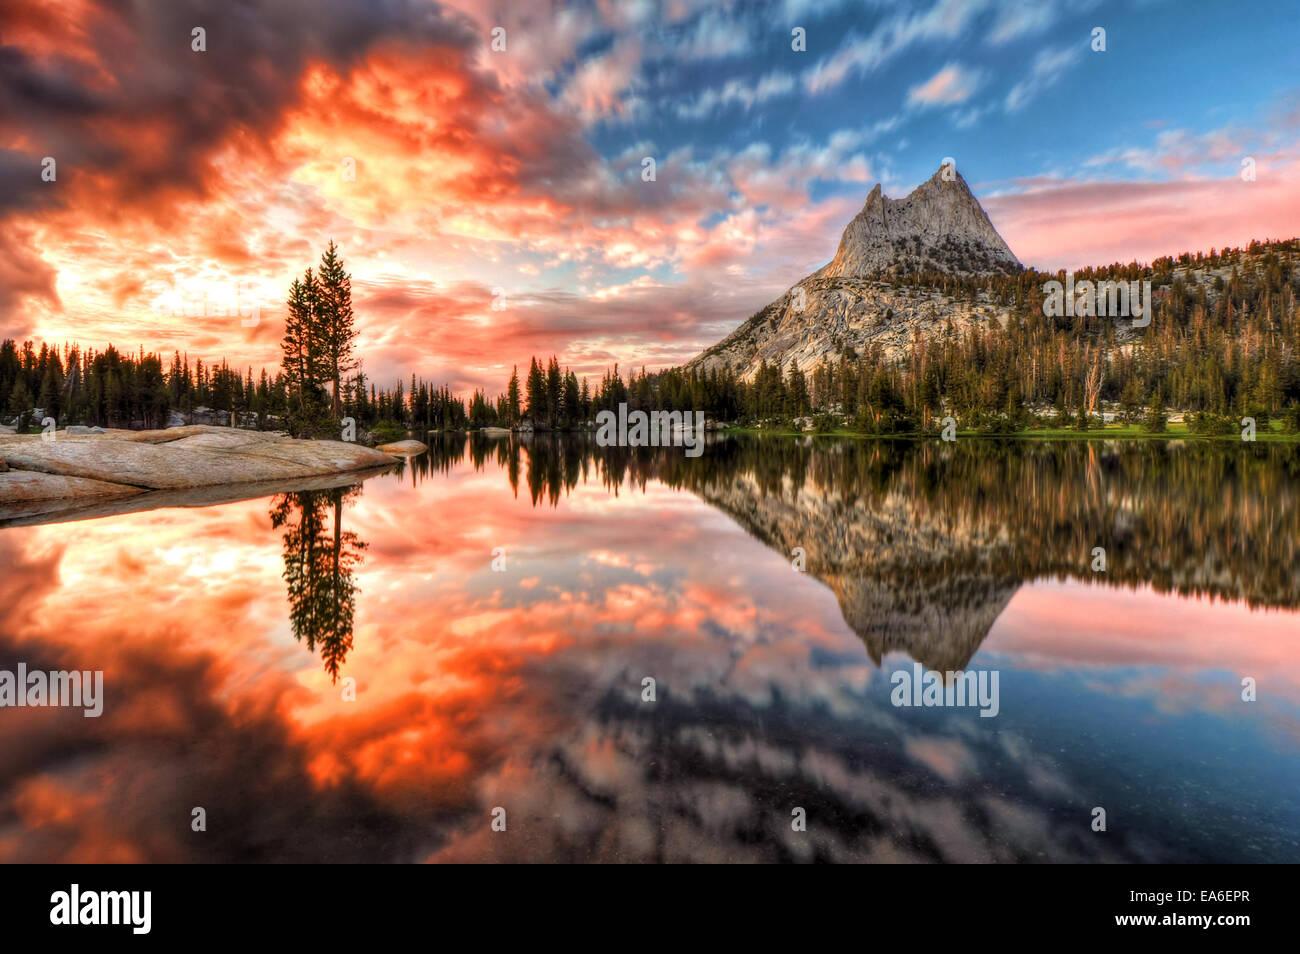 USA, California, Yosemite-Nationalpark, letzte Licht am Cathedral Lake Stockbild